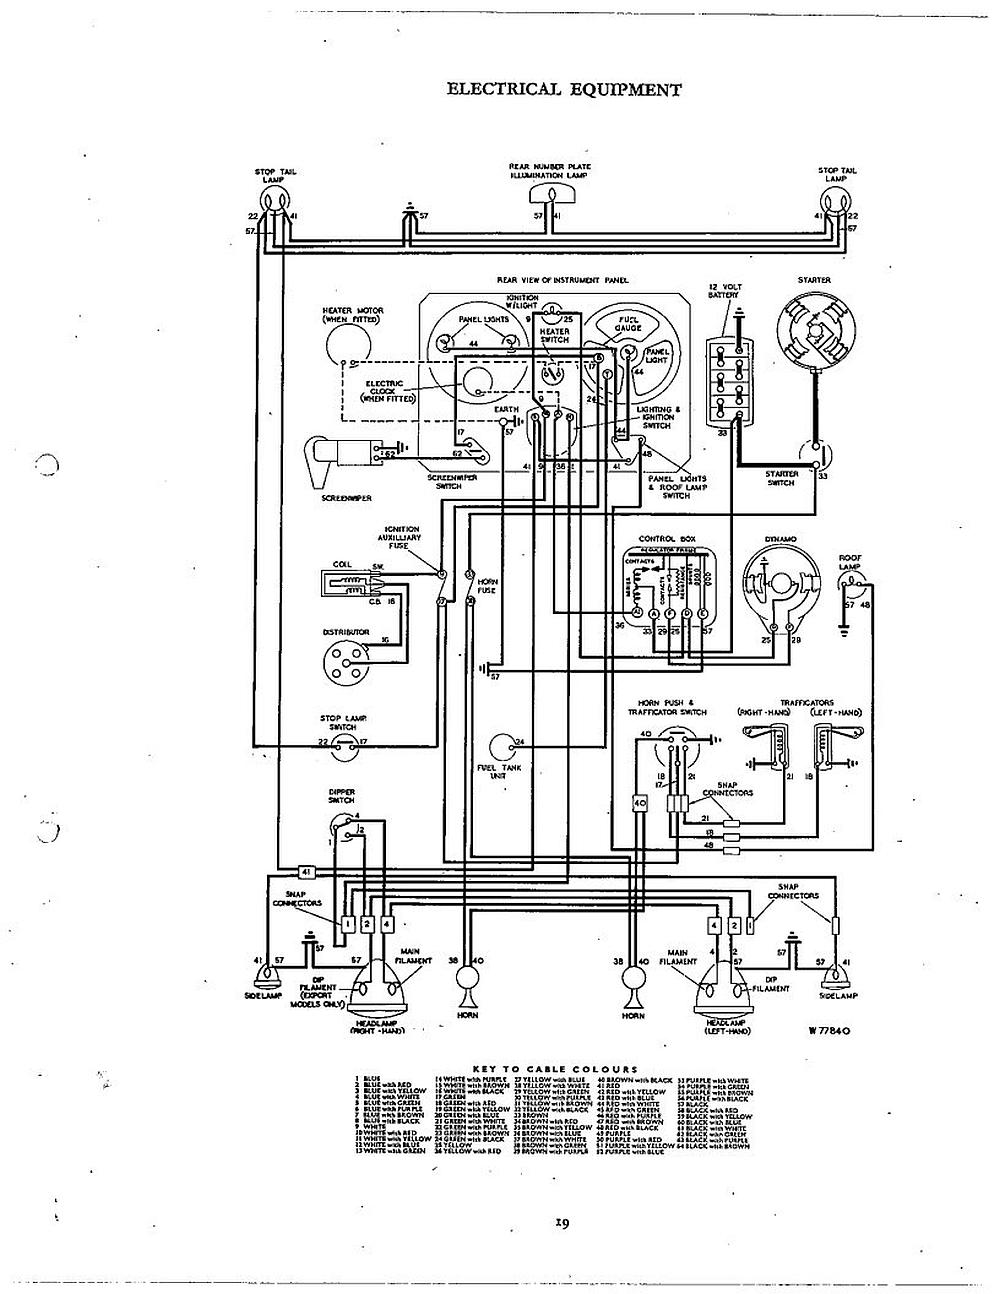 1973 triumph tr6 wiring diagram starting know about wiring diagram \u2022 autocar wiring diagram 1974 tr6 wiring diagram wiring schematics diagram rh mychampagnedaze com